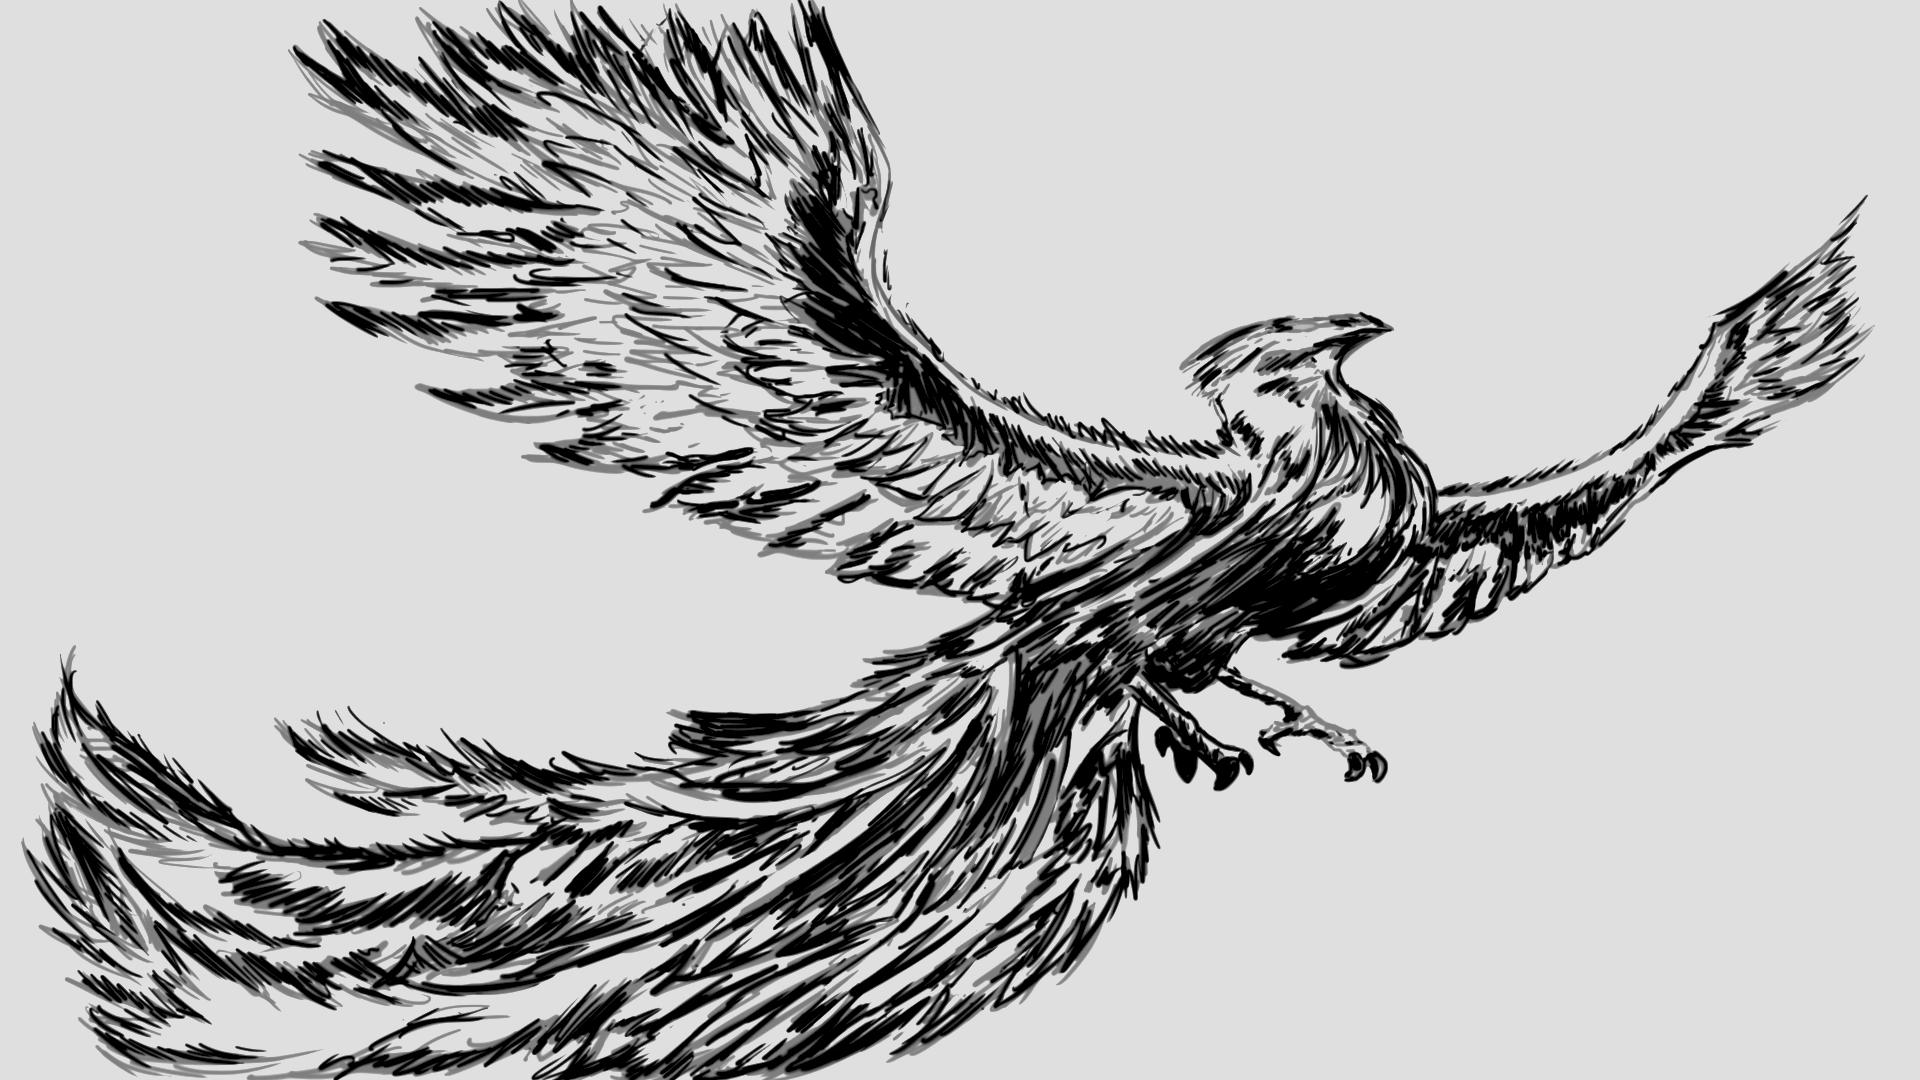 Drawn phoenix Drawn Griffin Griffin (Original – Drawing) AlexShawAnimation